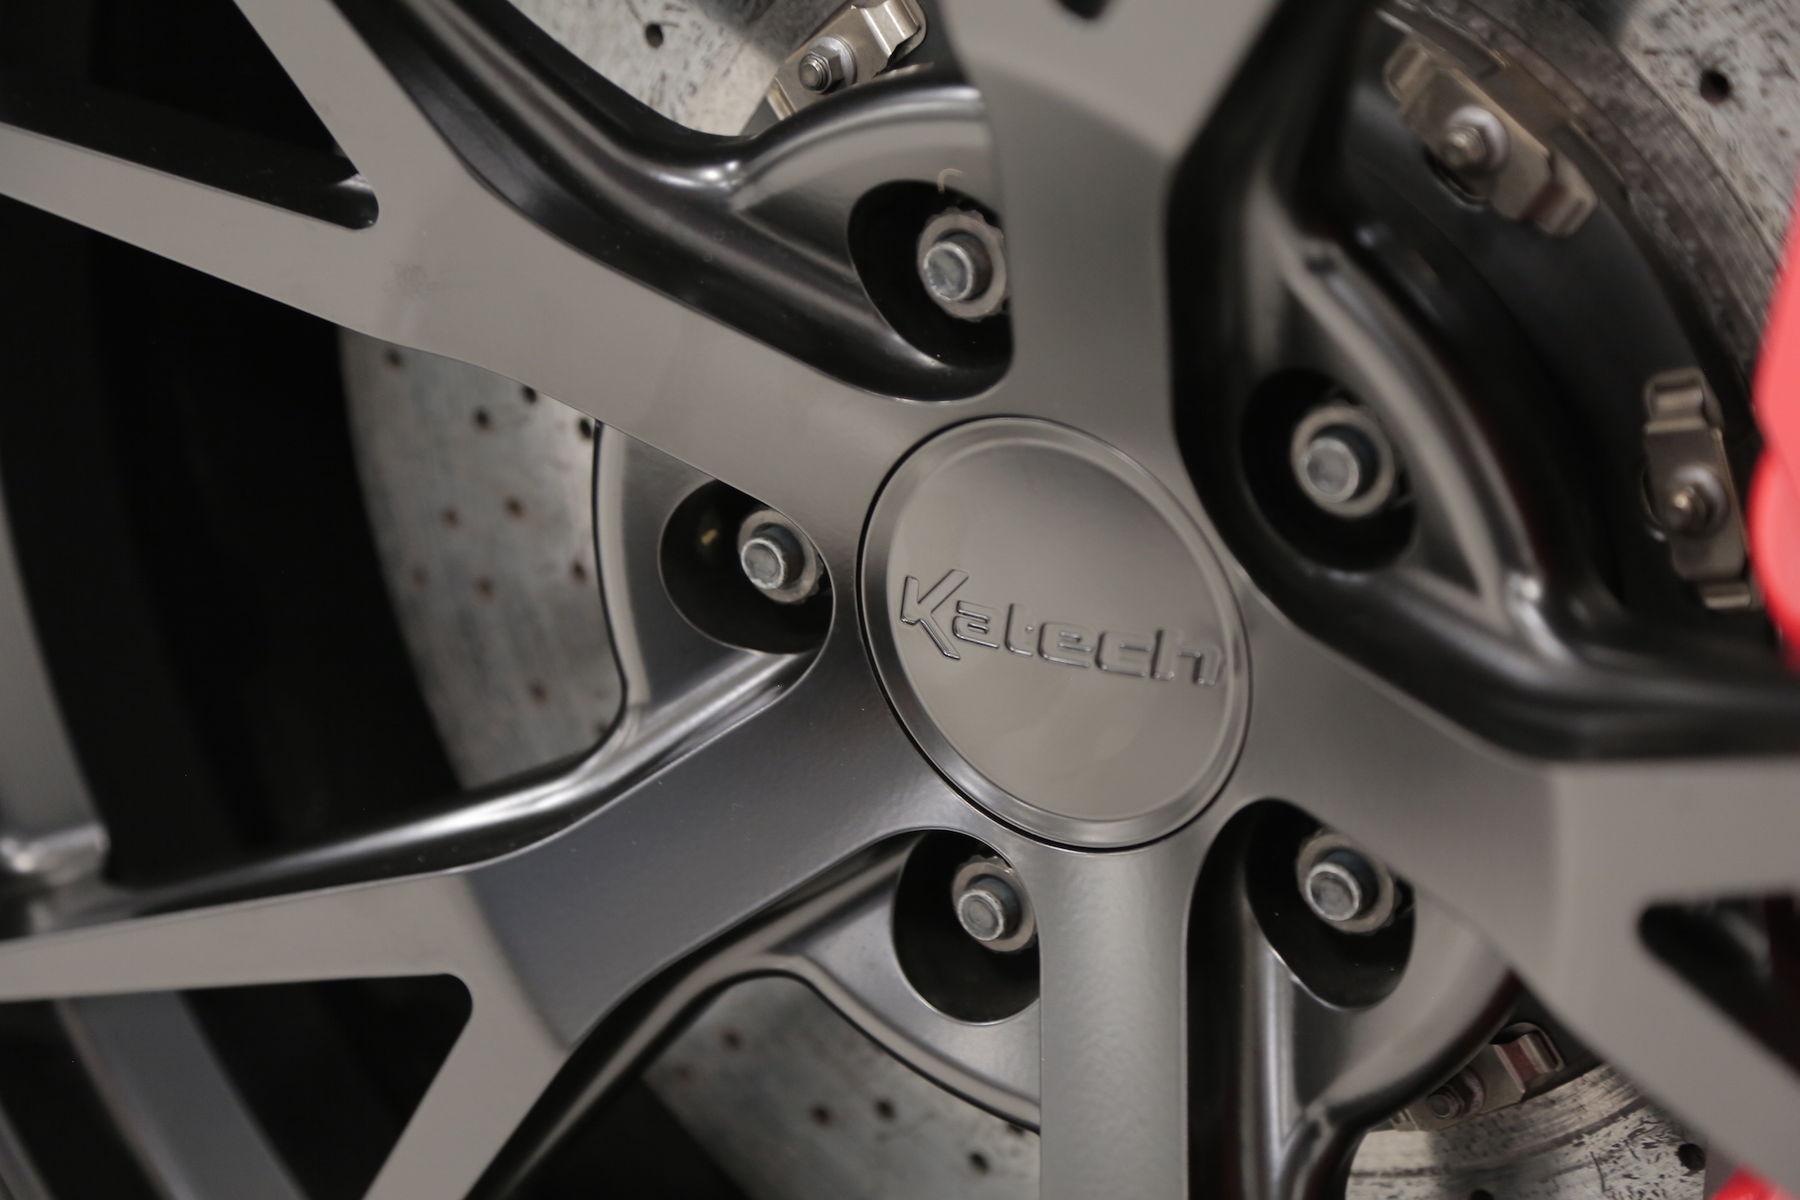 2017 Chevrolet Corvette Z06 | Katech's 850HP C7 Corvette Z06 on Forgeline One Piece Forged Monoblock KT1 Wheels